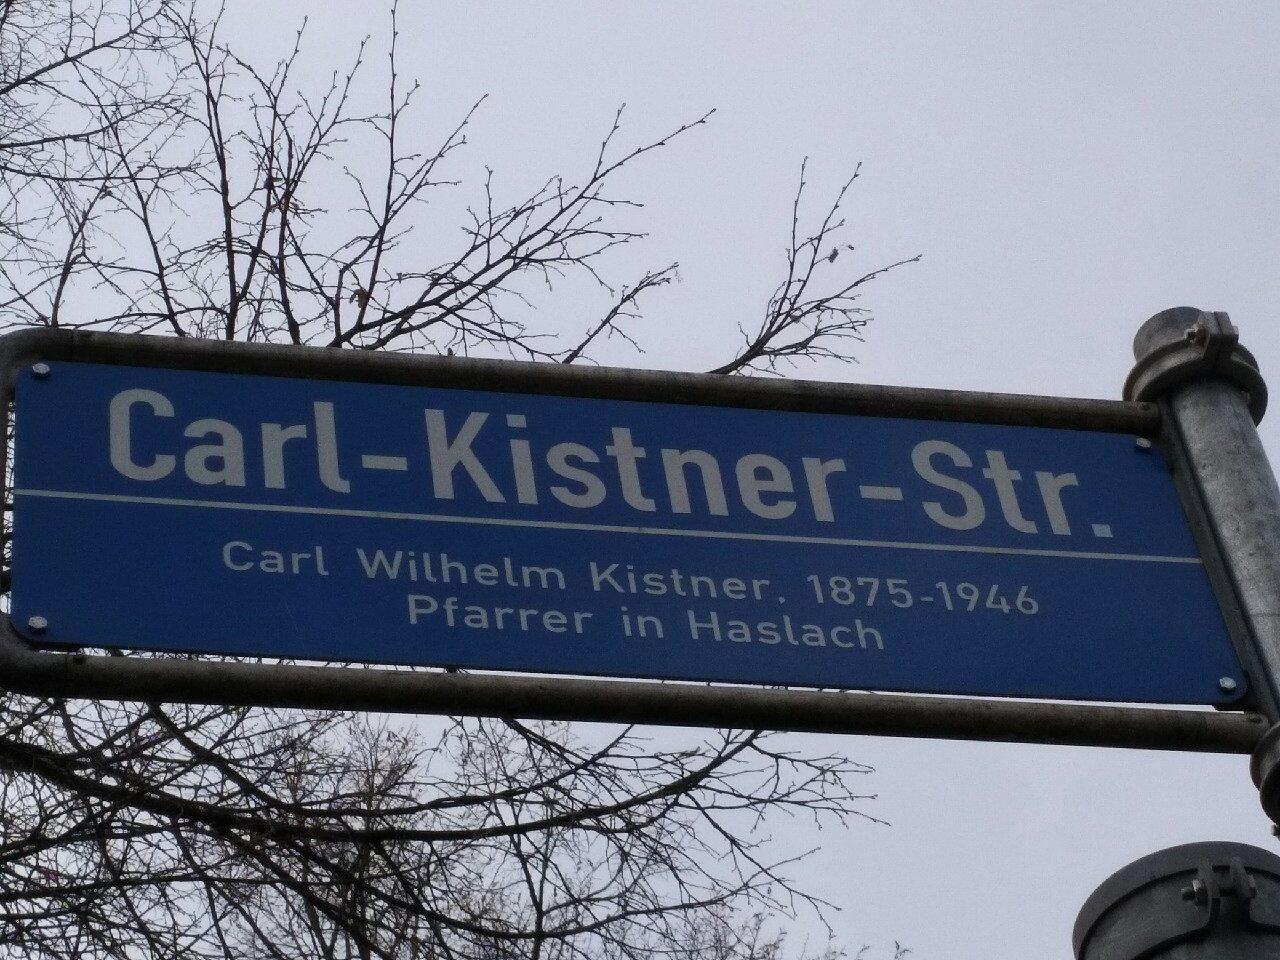 Carl-Kistner-Strasse in Freiburg - Haslach